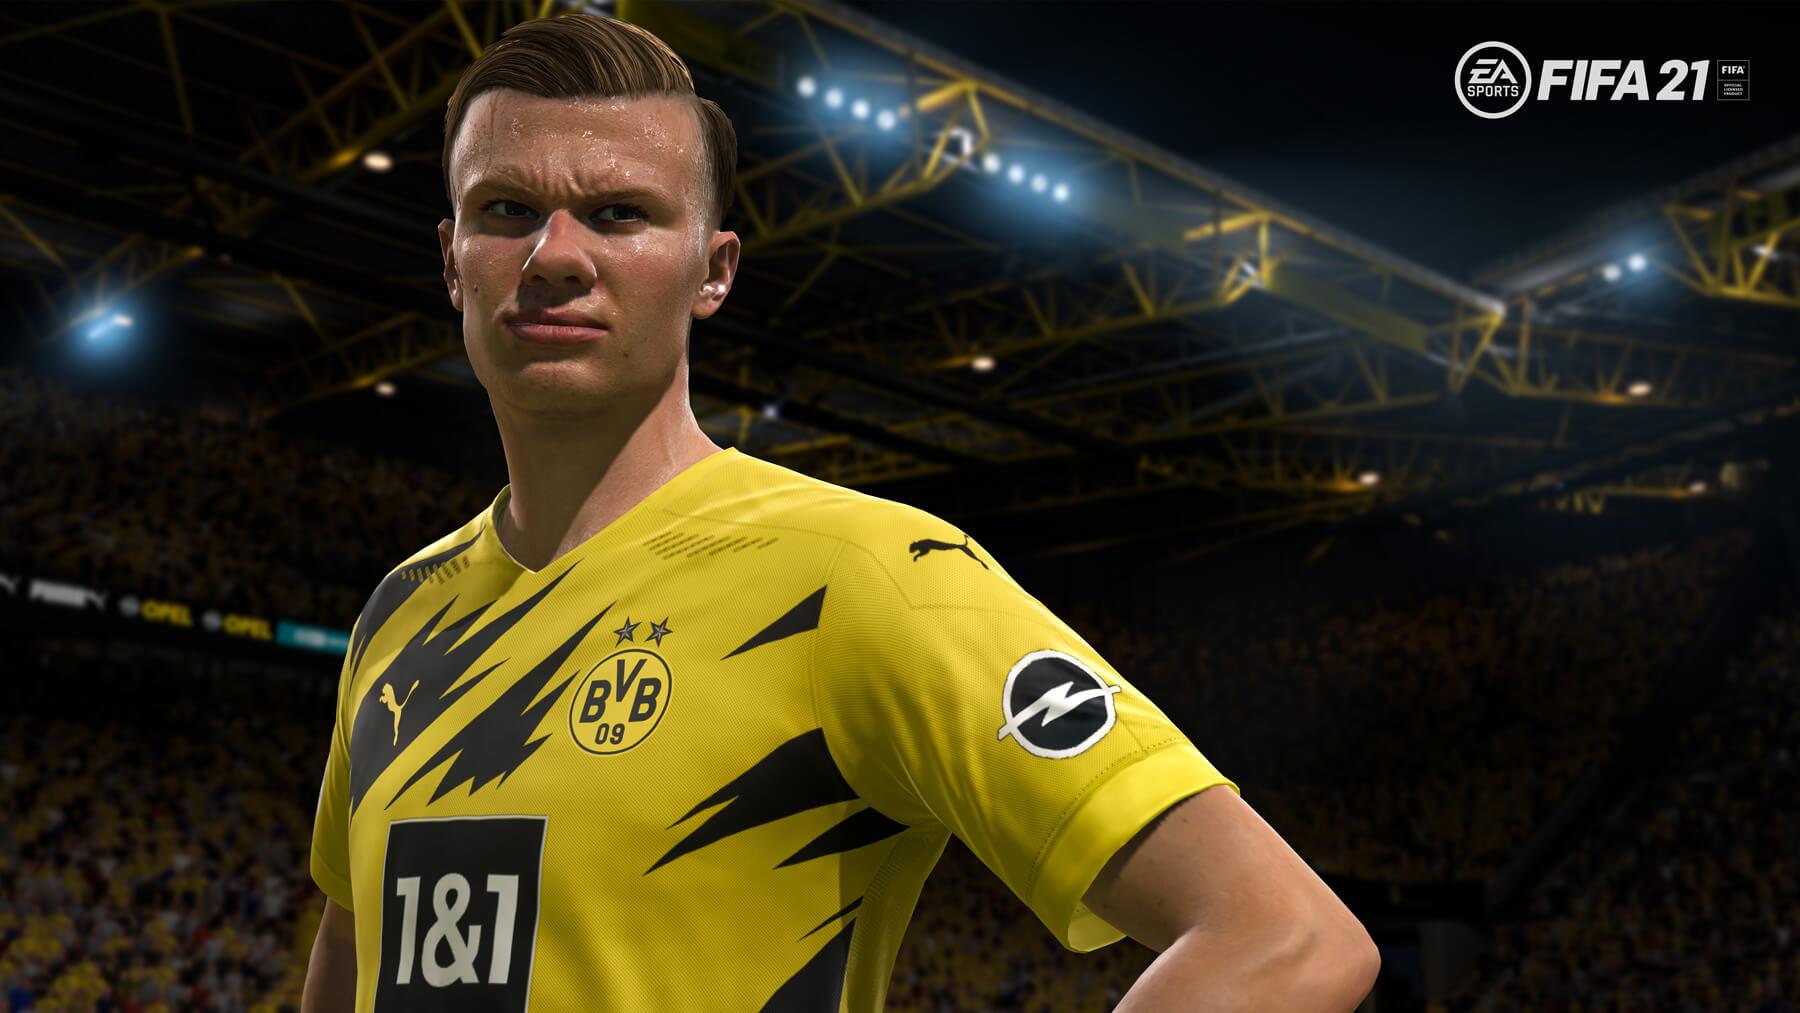 FIFA 21 News 1